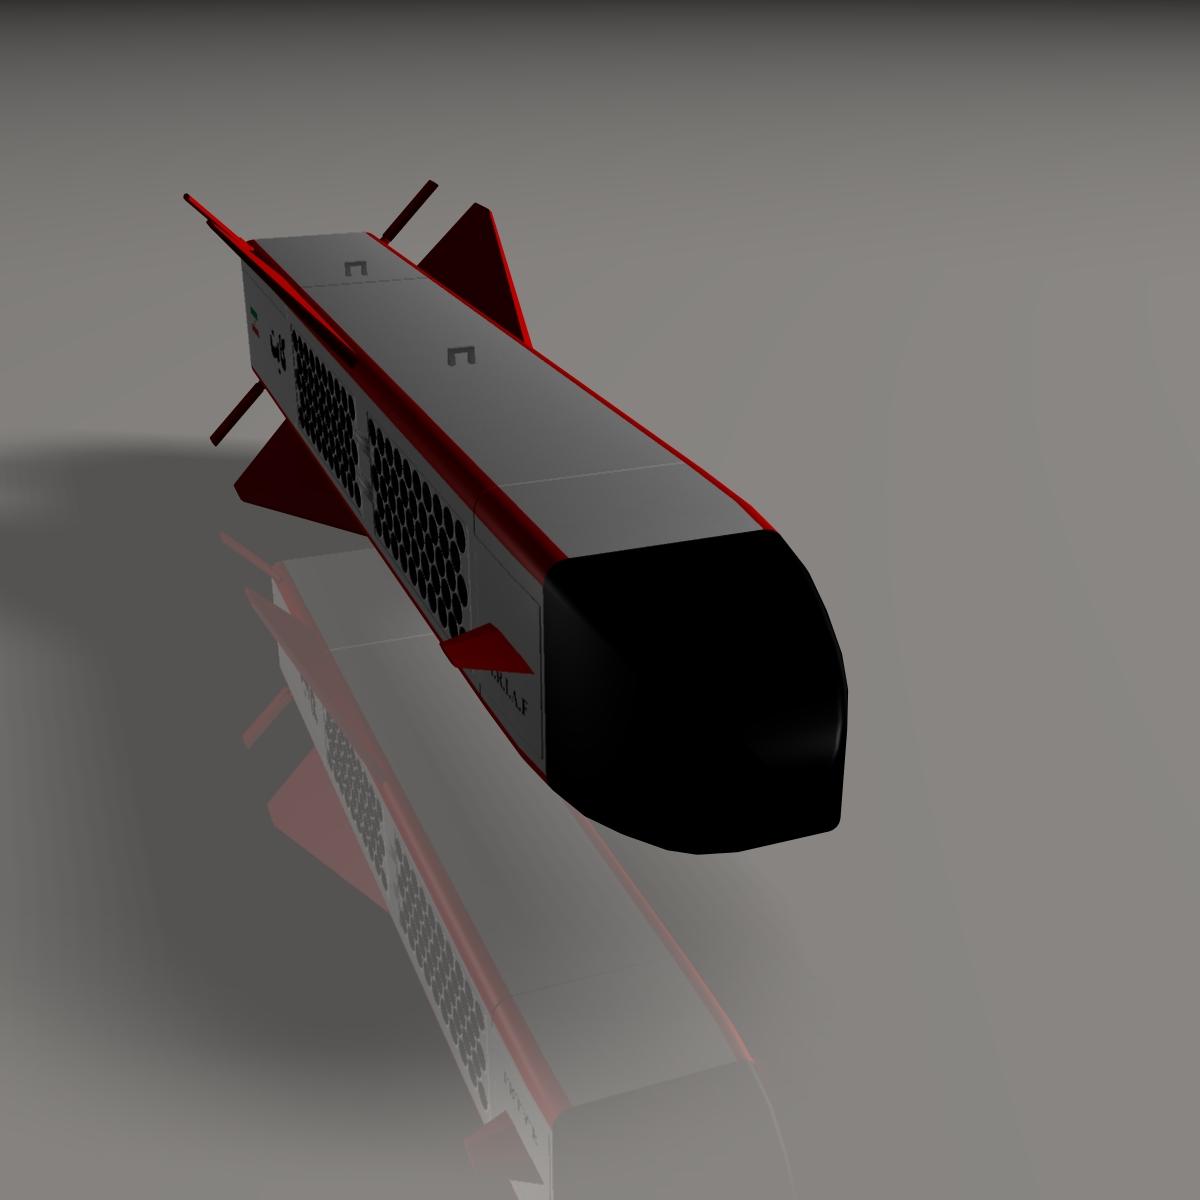 iranian kite, 184 round 3d model 3ds dxf cob x obj 146851